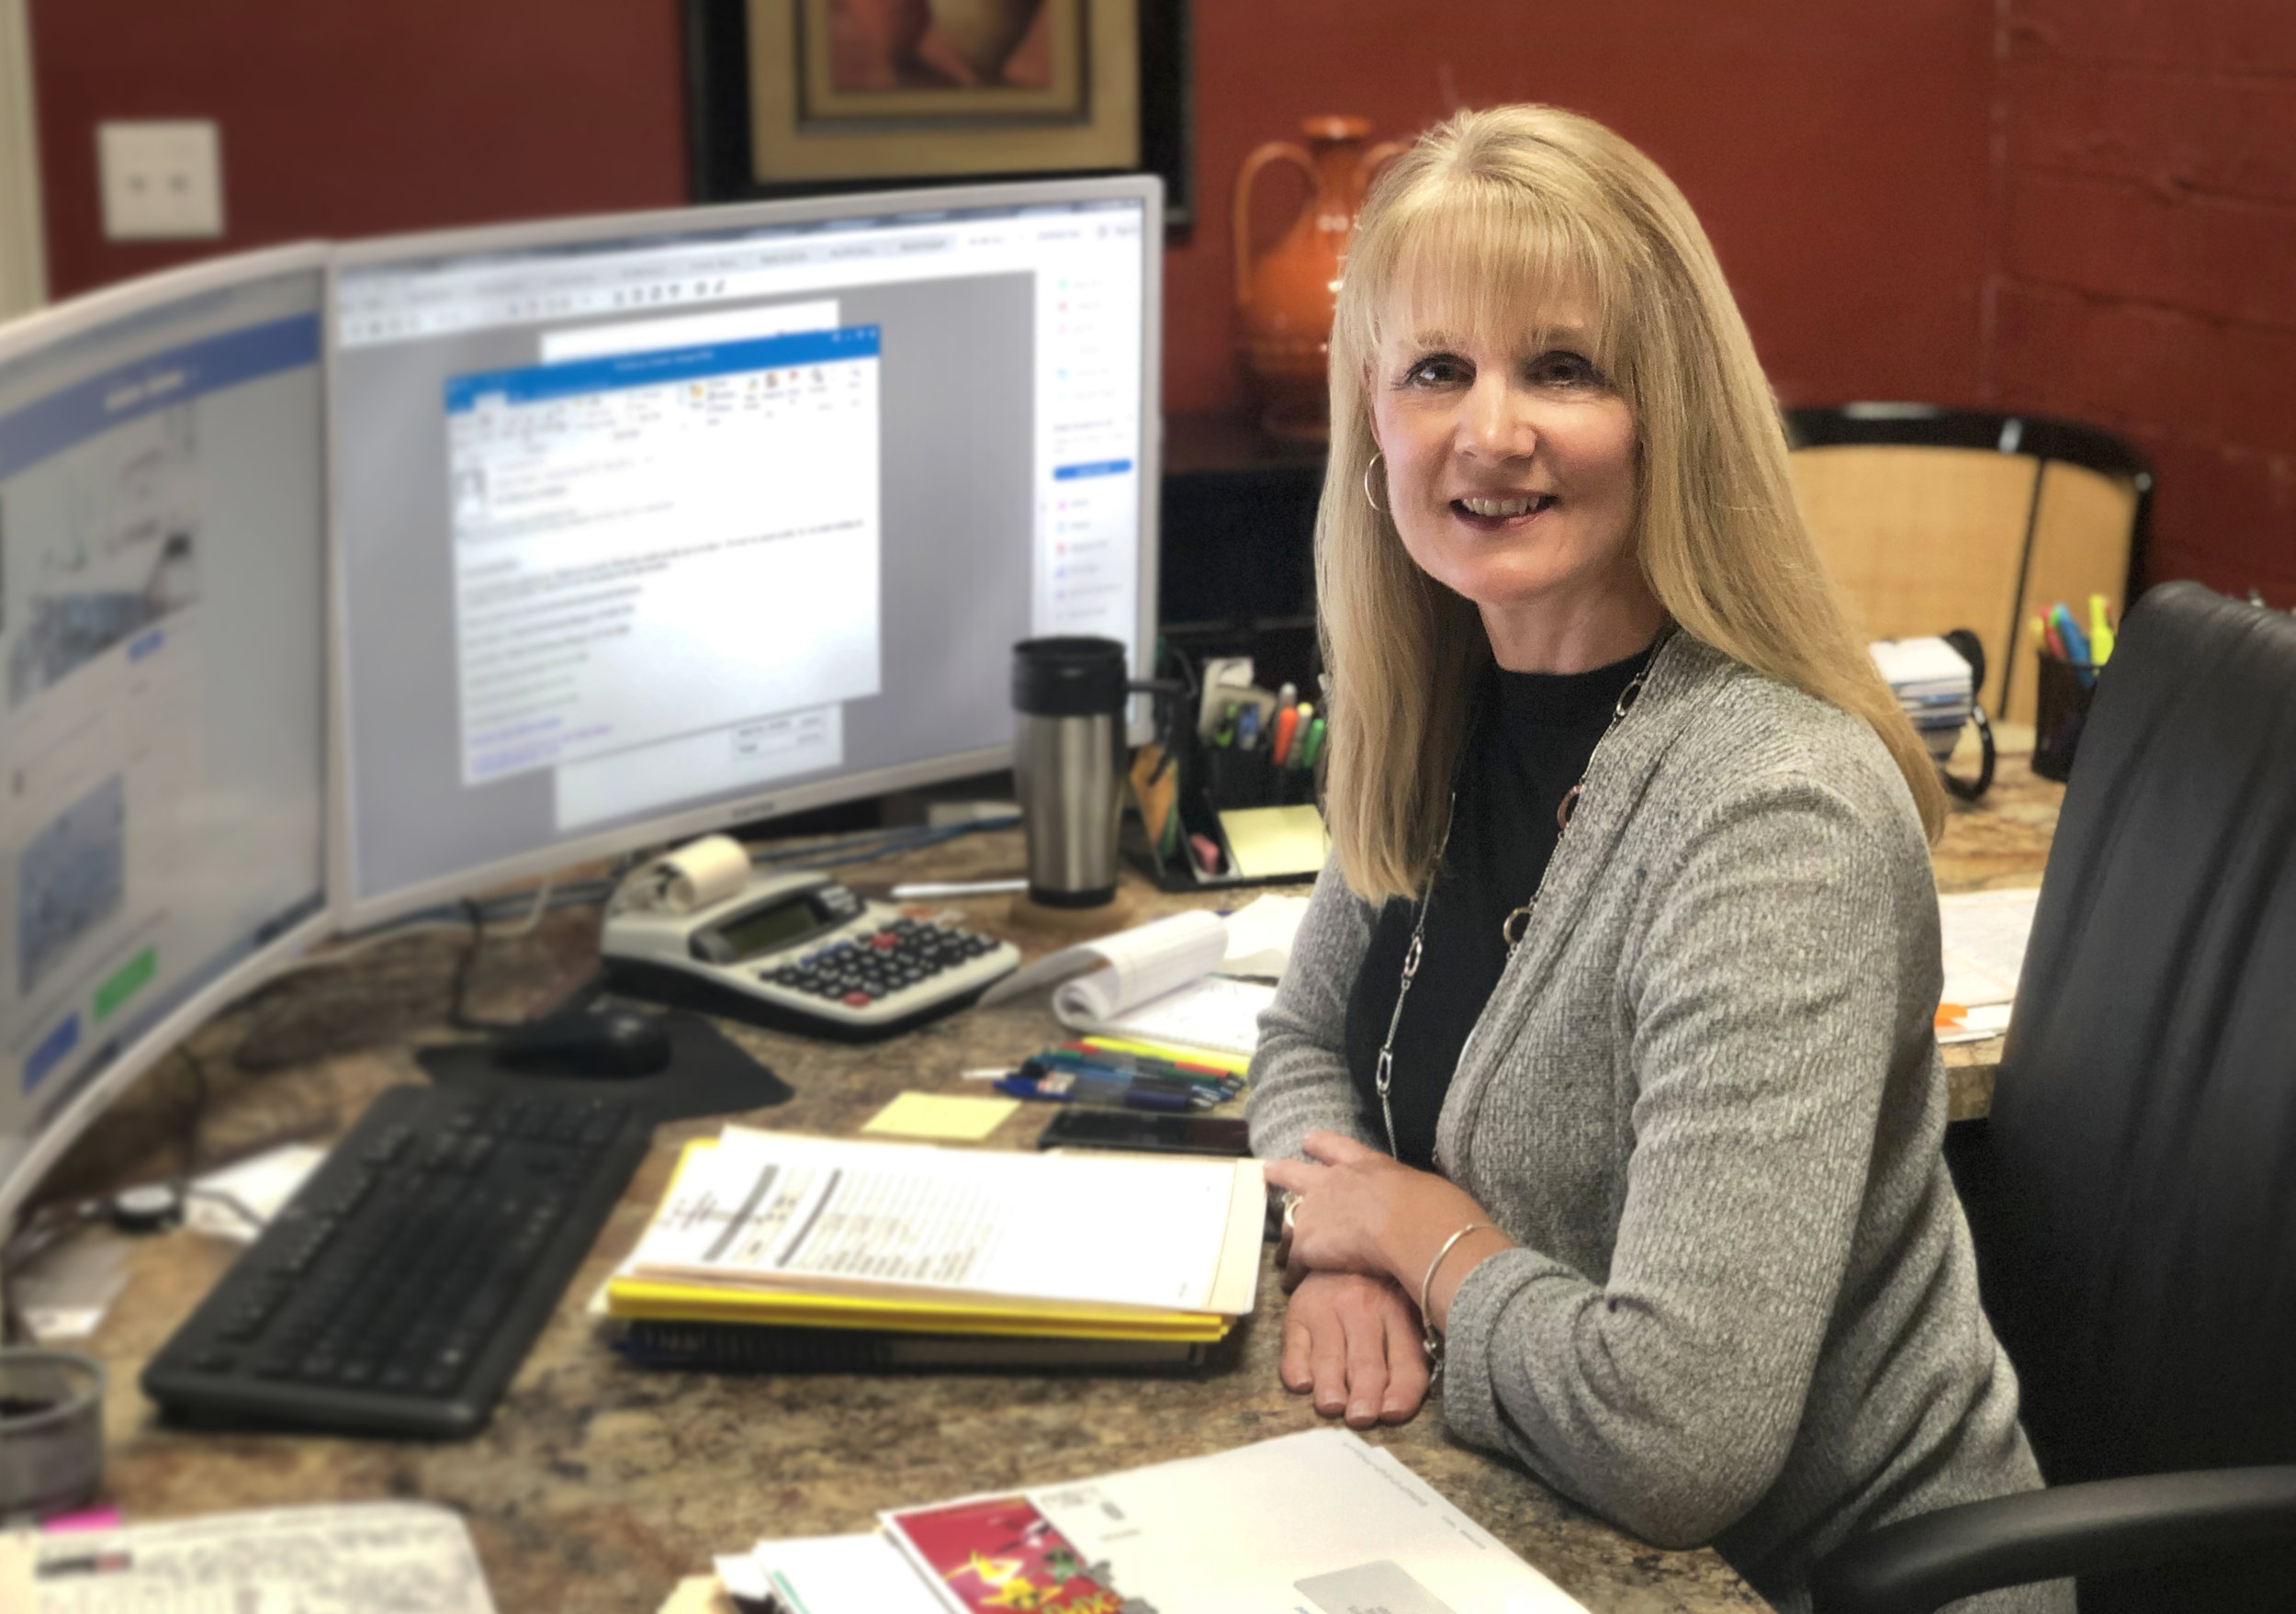 Mary Adams - Vice President, Operations & Development